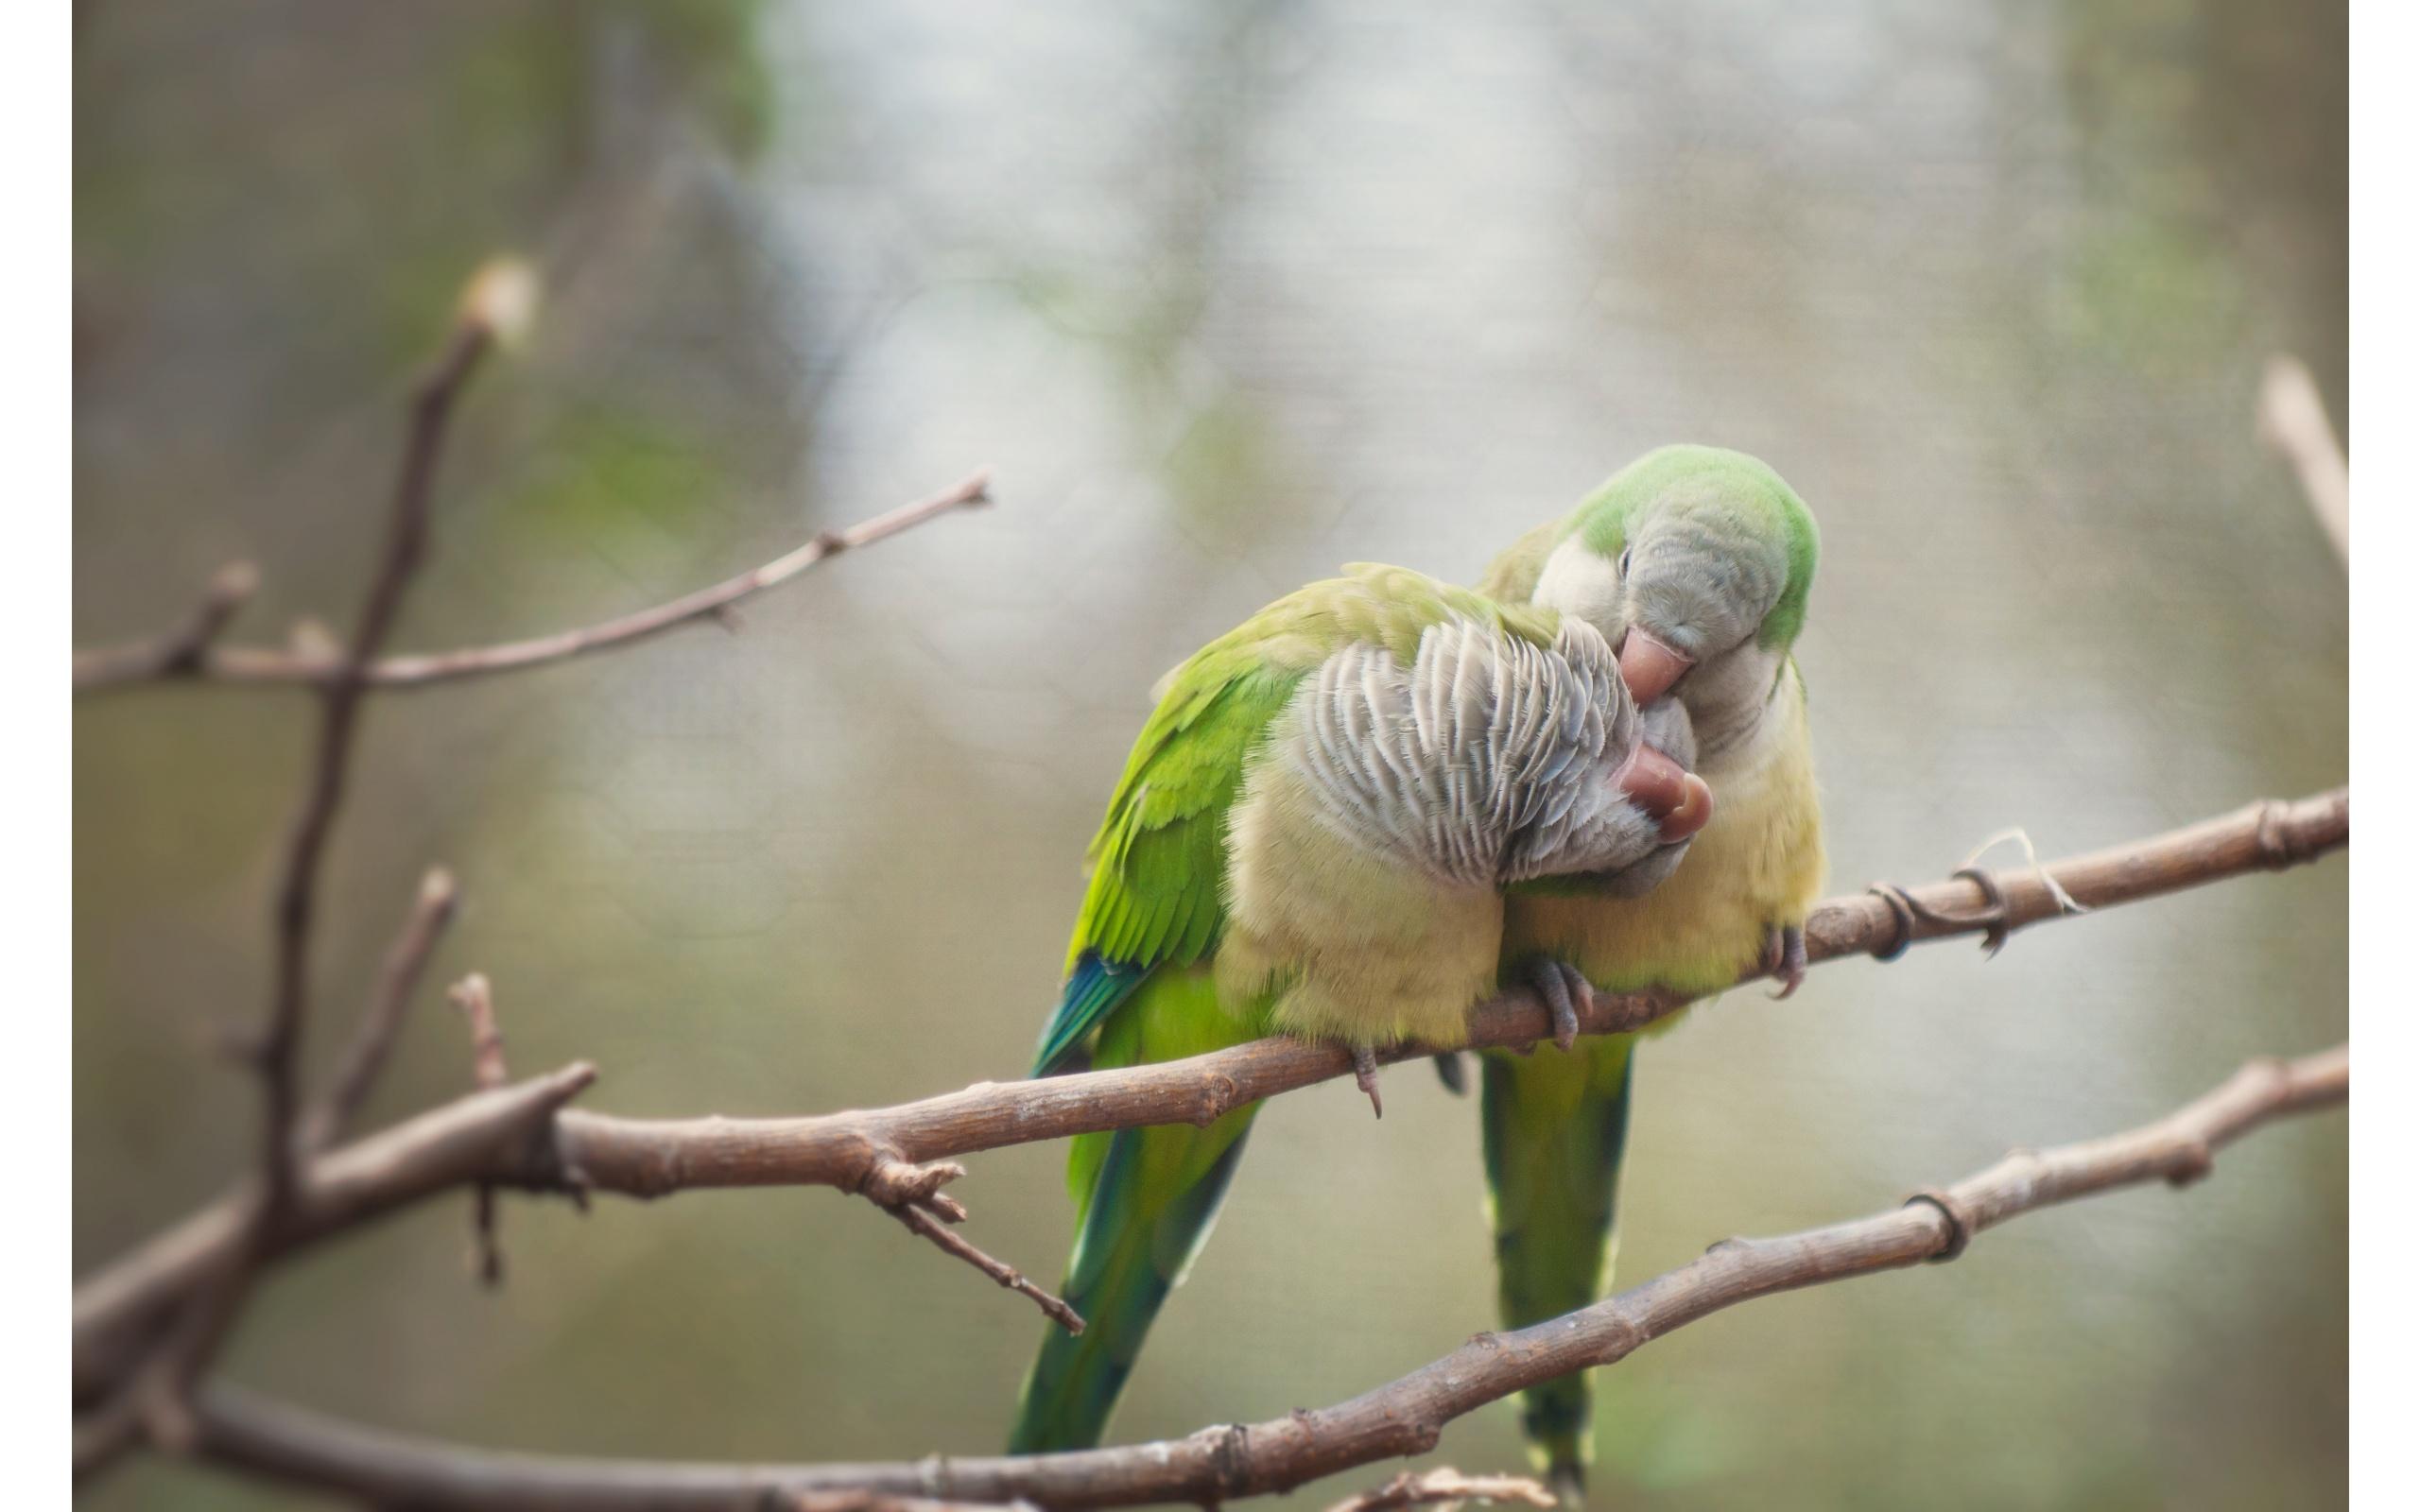 Free Download Love Birds 2560 X 1600 Download Close 2560x1600 For Your Desktop Mobile Tablet Explore 76 Wallpaper Of Love Birds Free Wallpapers And Screensavers Birds Free Love Screensavers